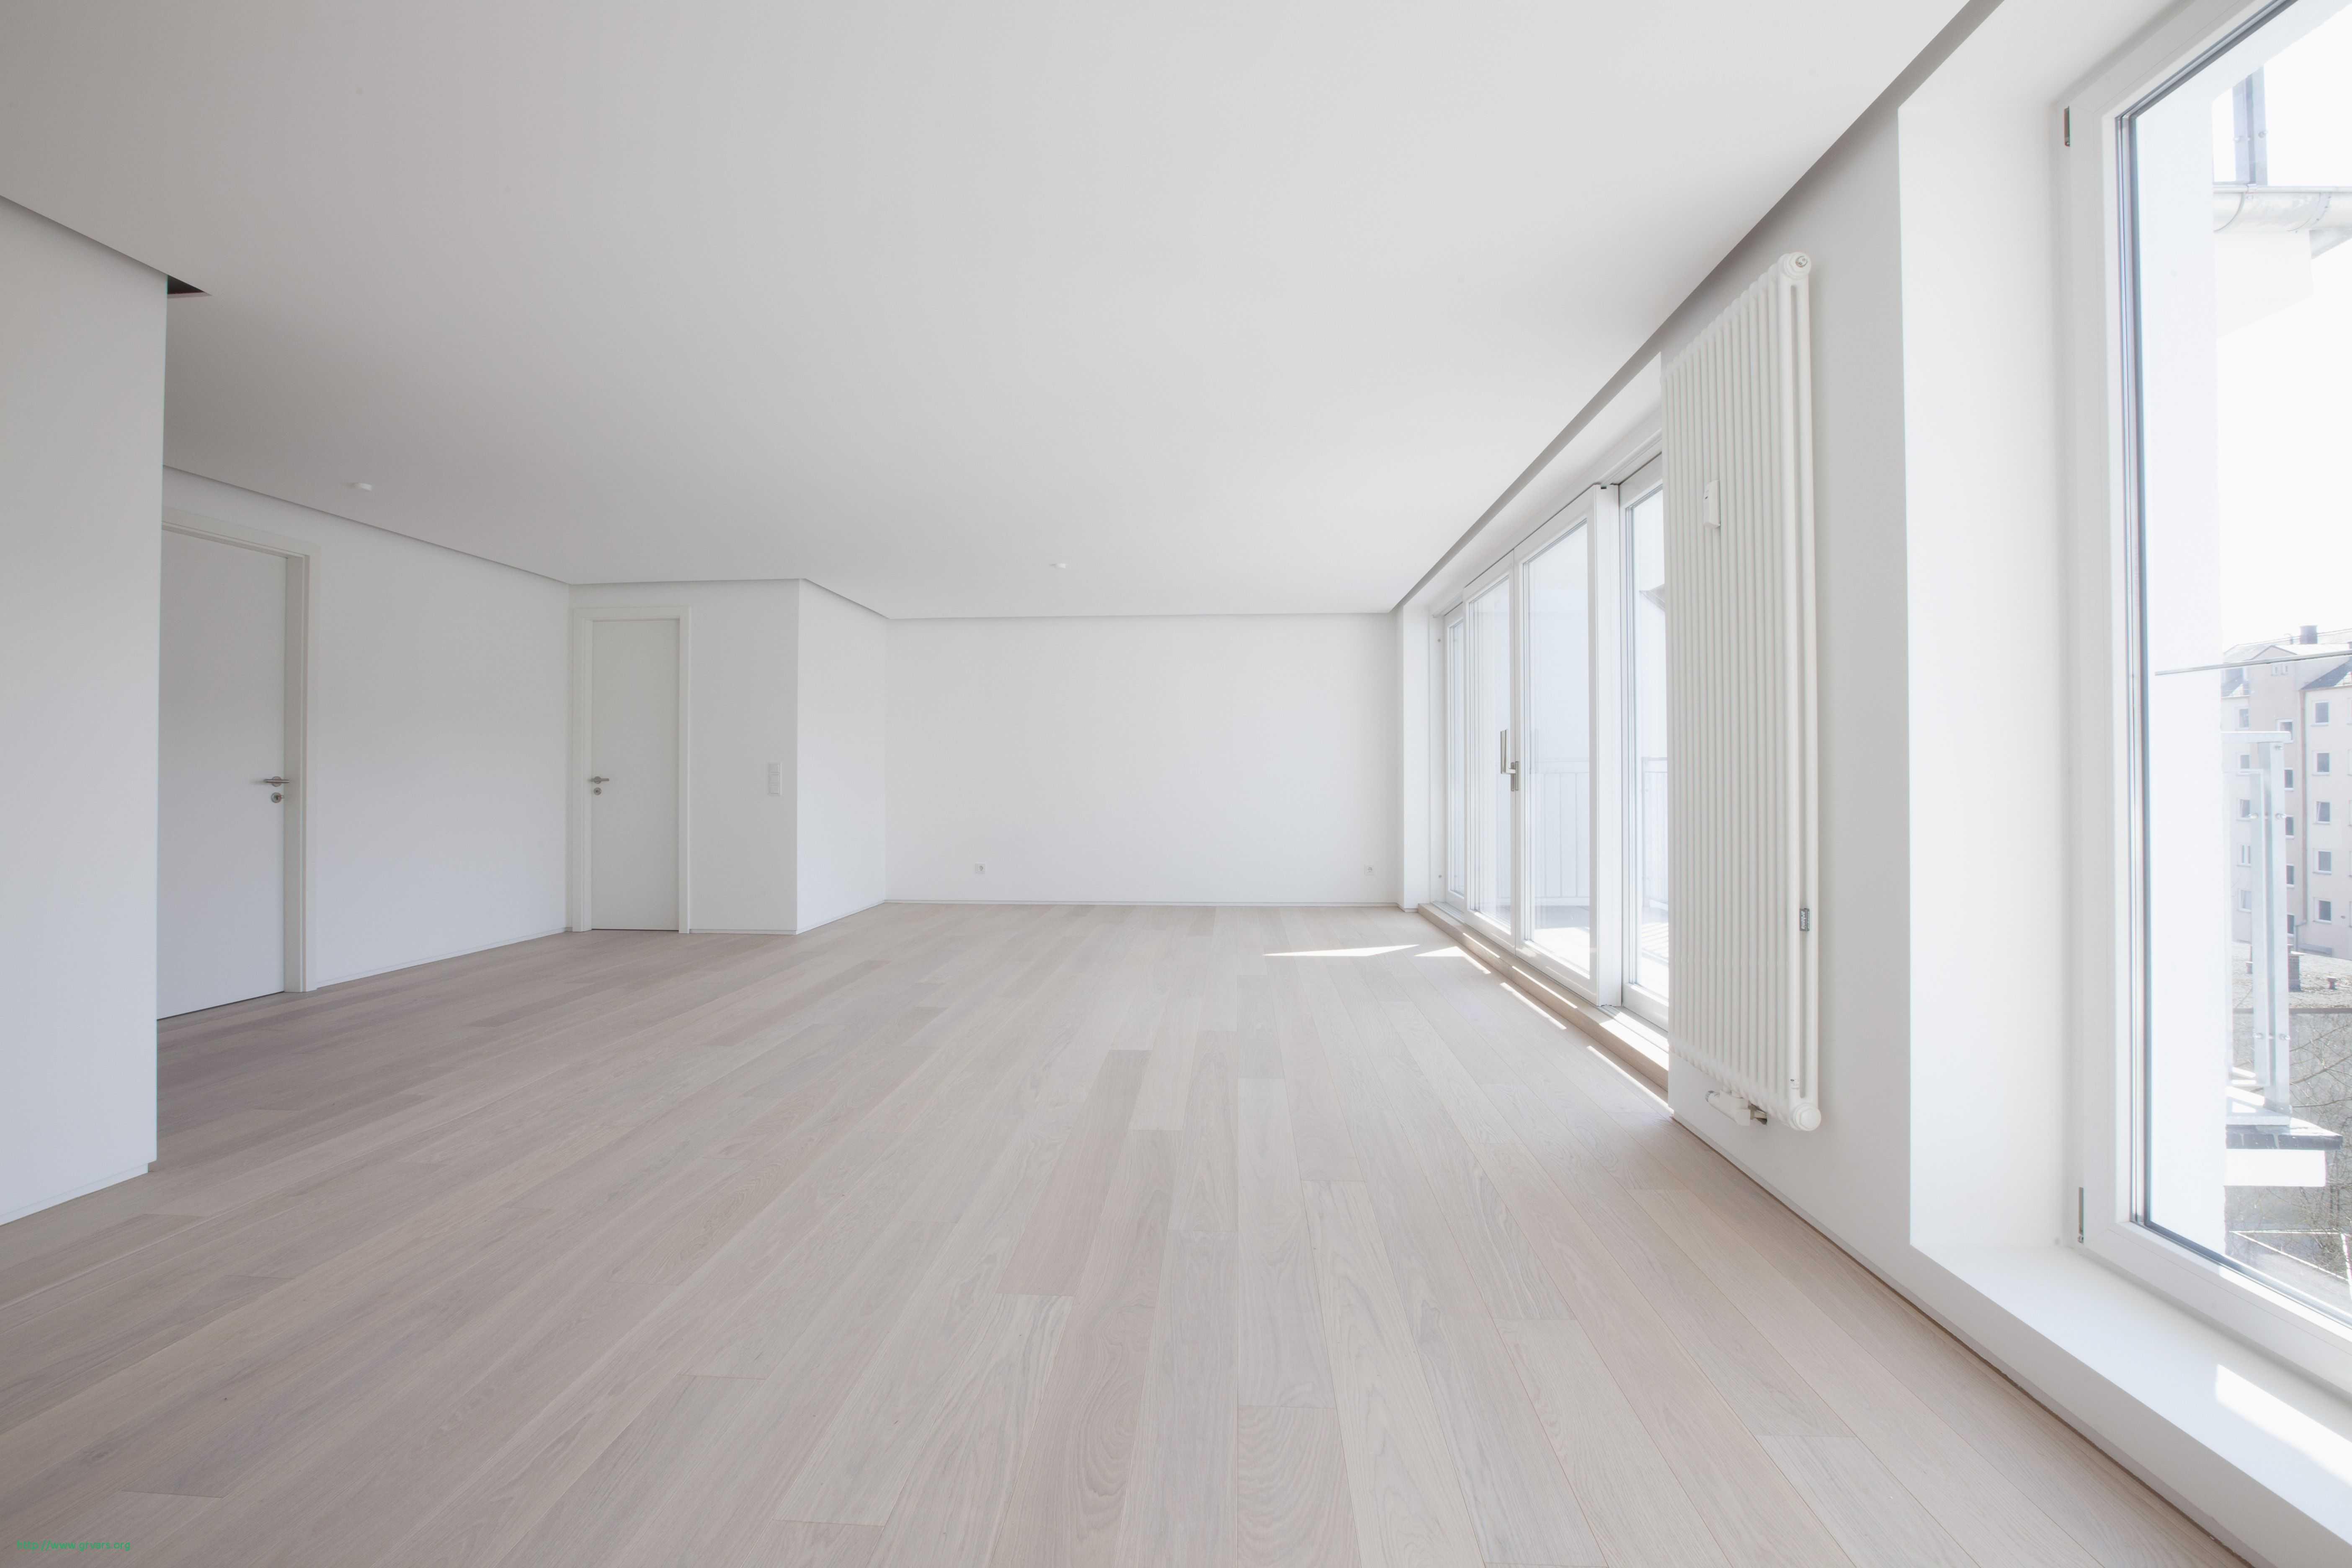 22 Stylish Engineered Hardwood Floor Colors   Unique ...